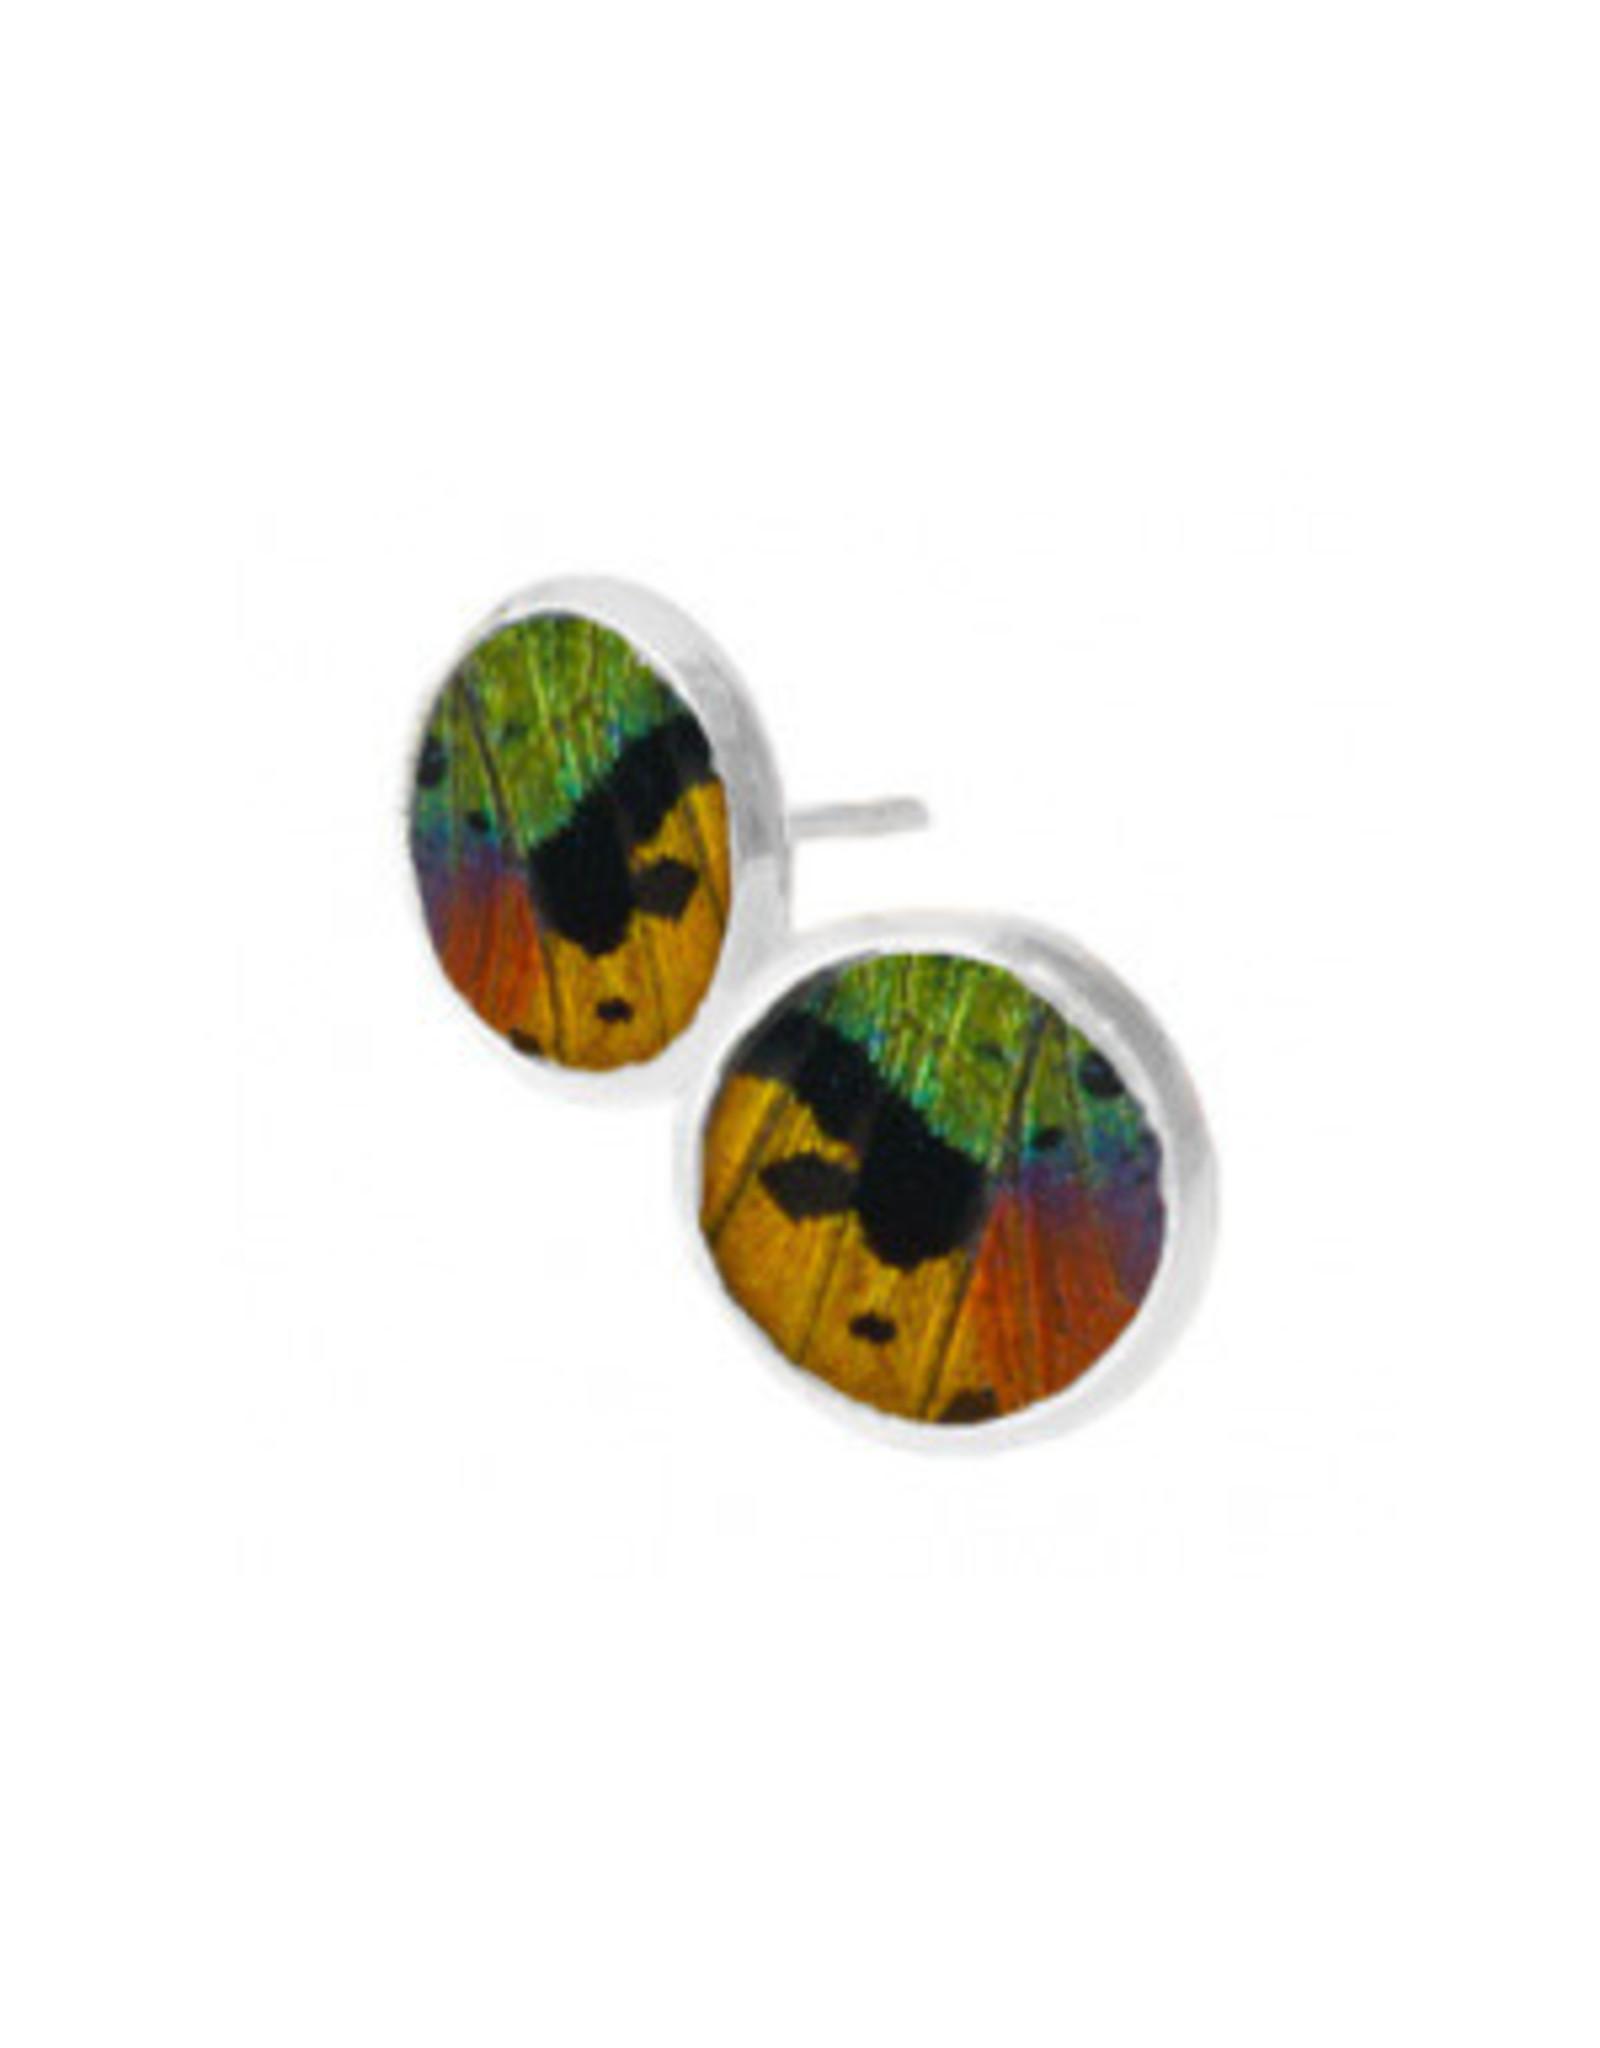 Asana Natural Arts Sunset Moth Wing Post Earrings, Rainbow - Asana Natural Arts